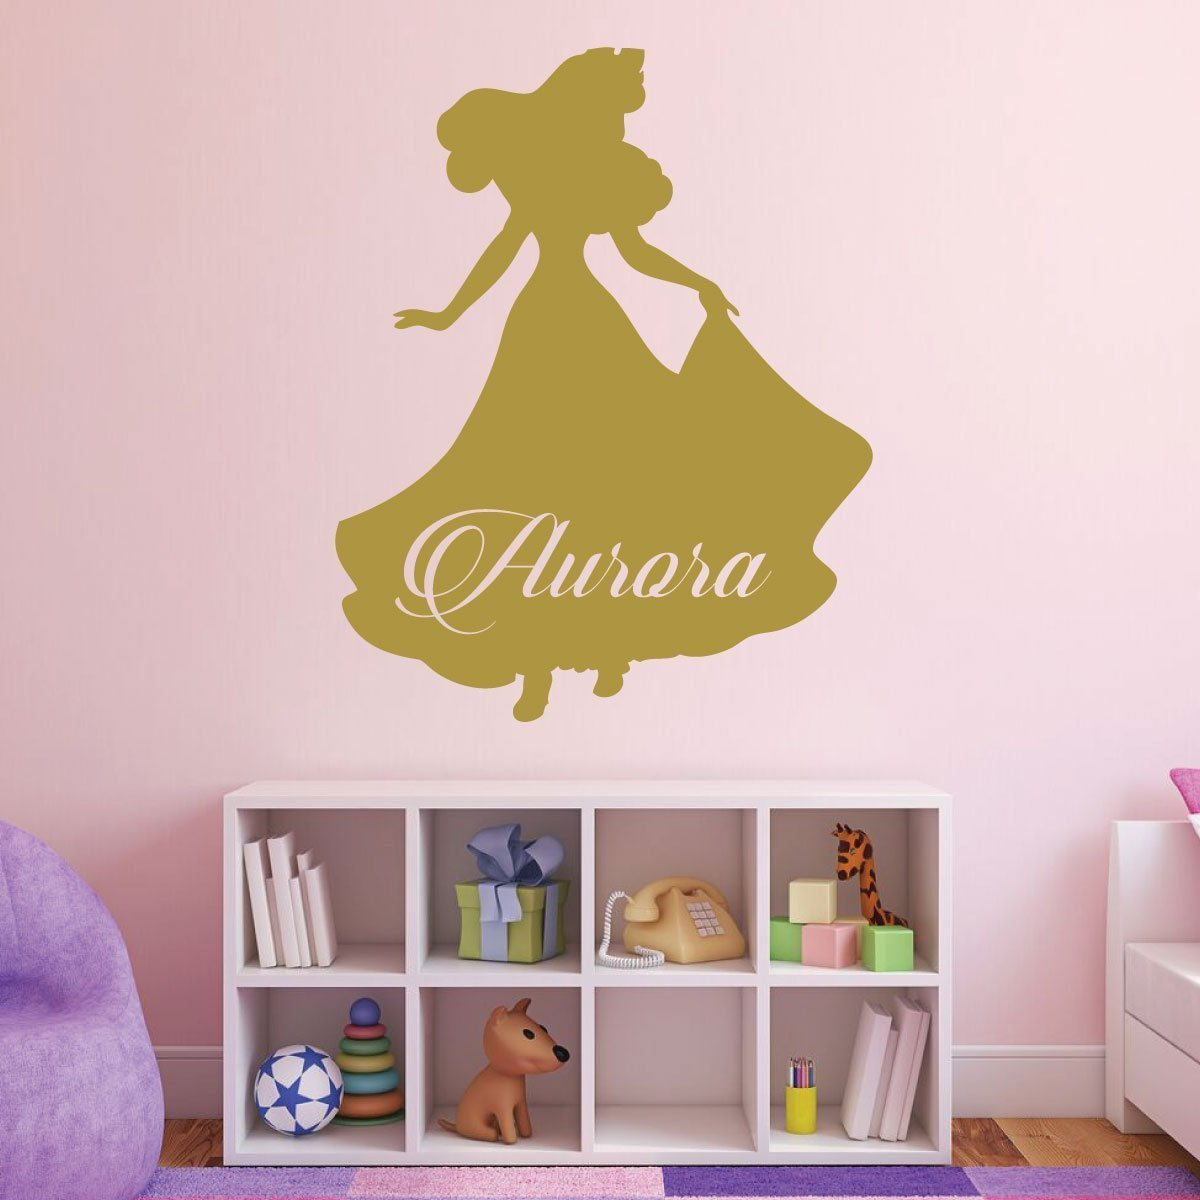 Amazon.com: Aurora - Personalized, Disney Princess Vinyl Wall ...